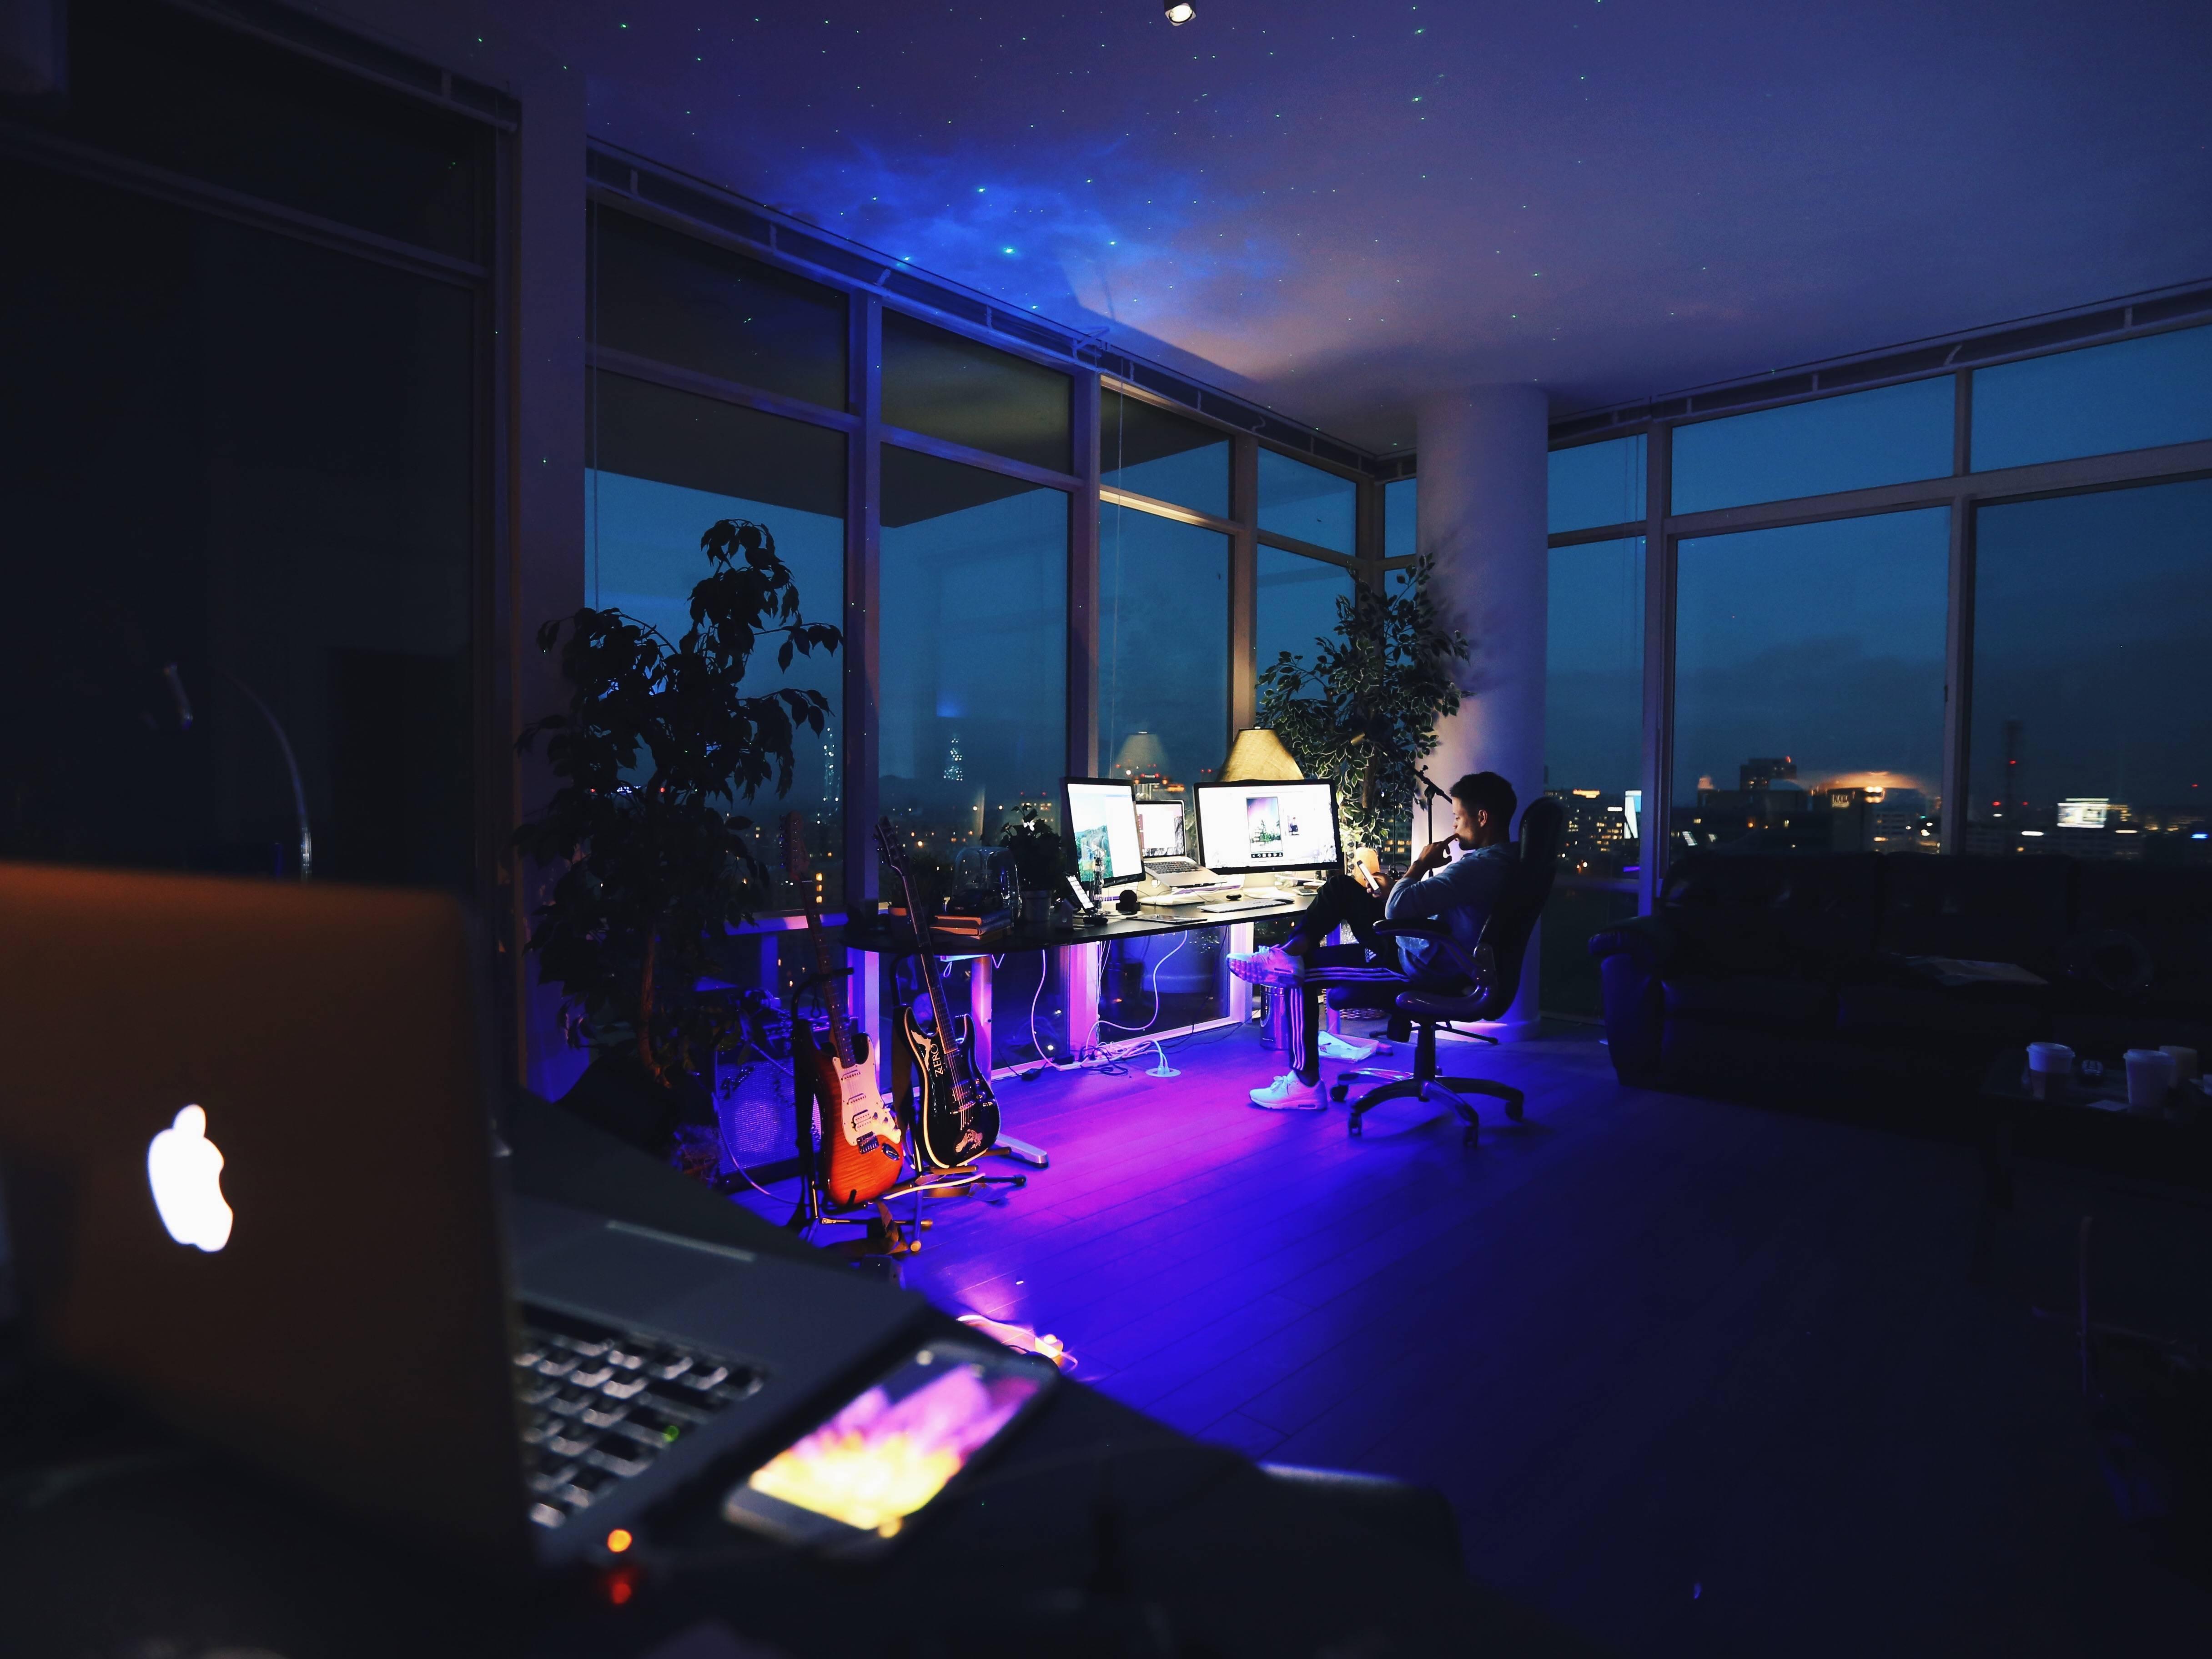 Fotos gratis habitaci n iluminaci n escenario captura - Habitacion iluminacion ...